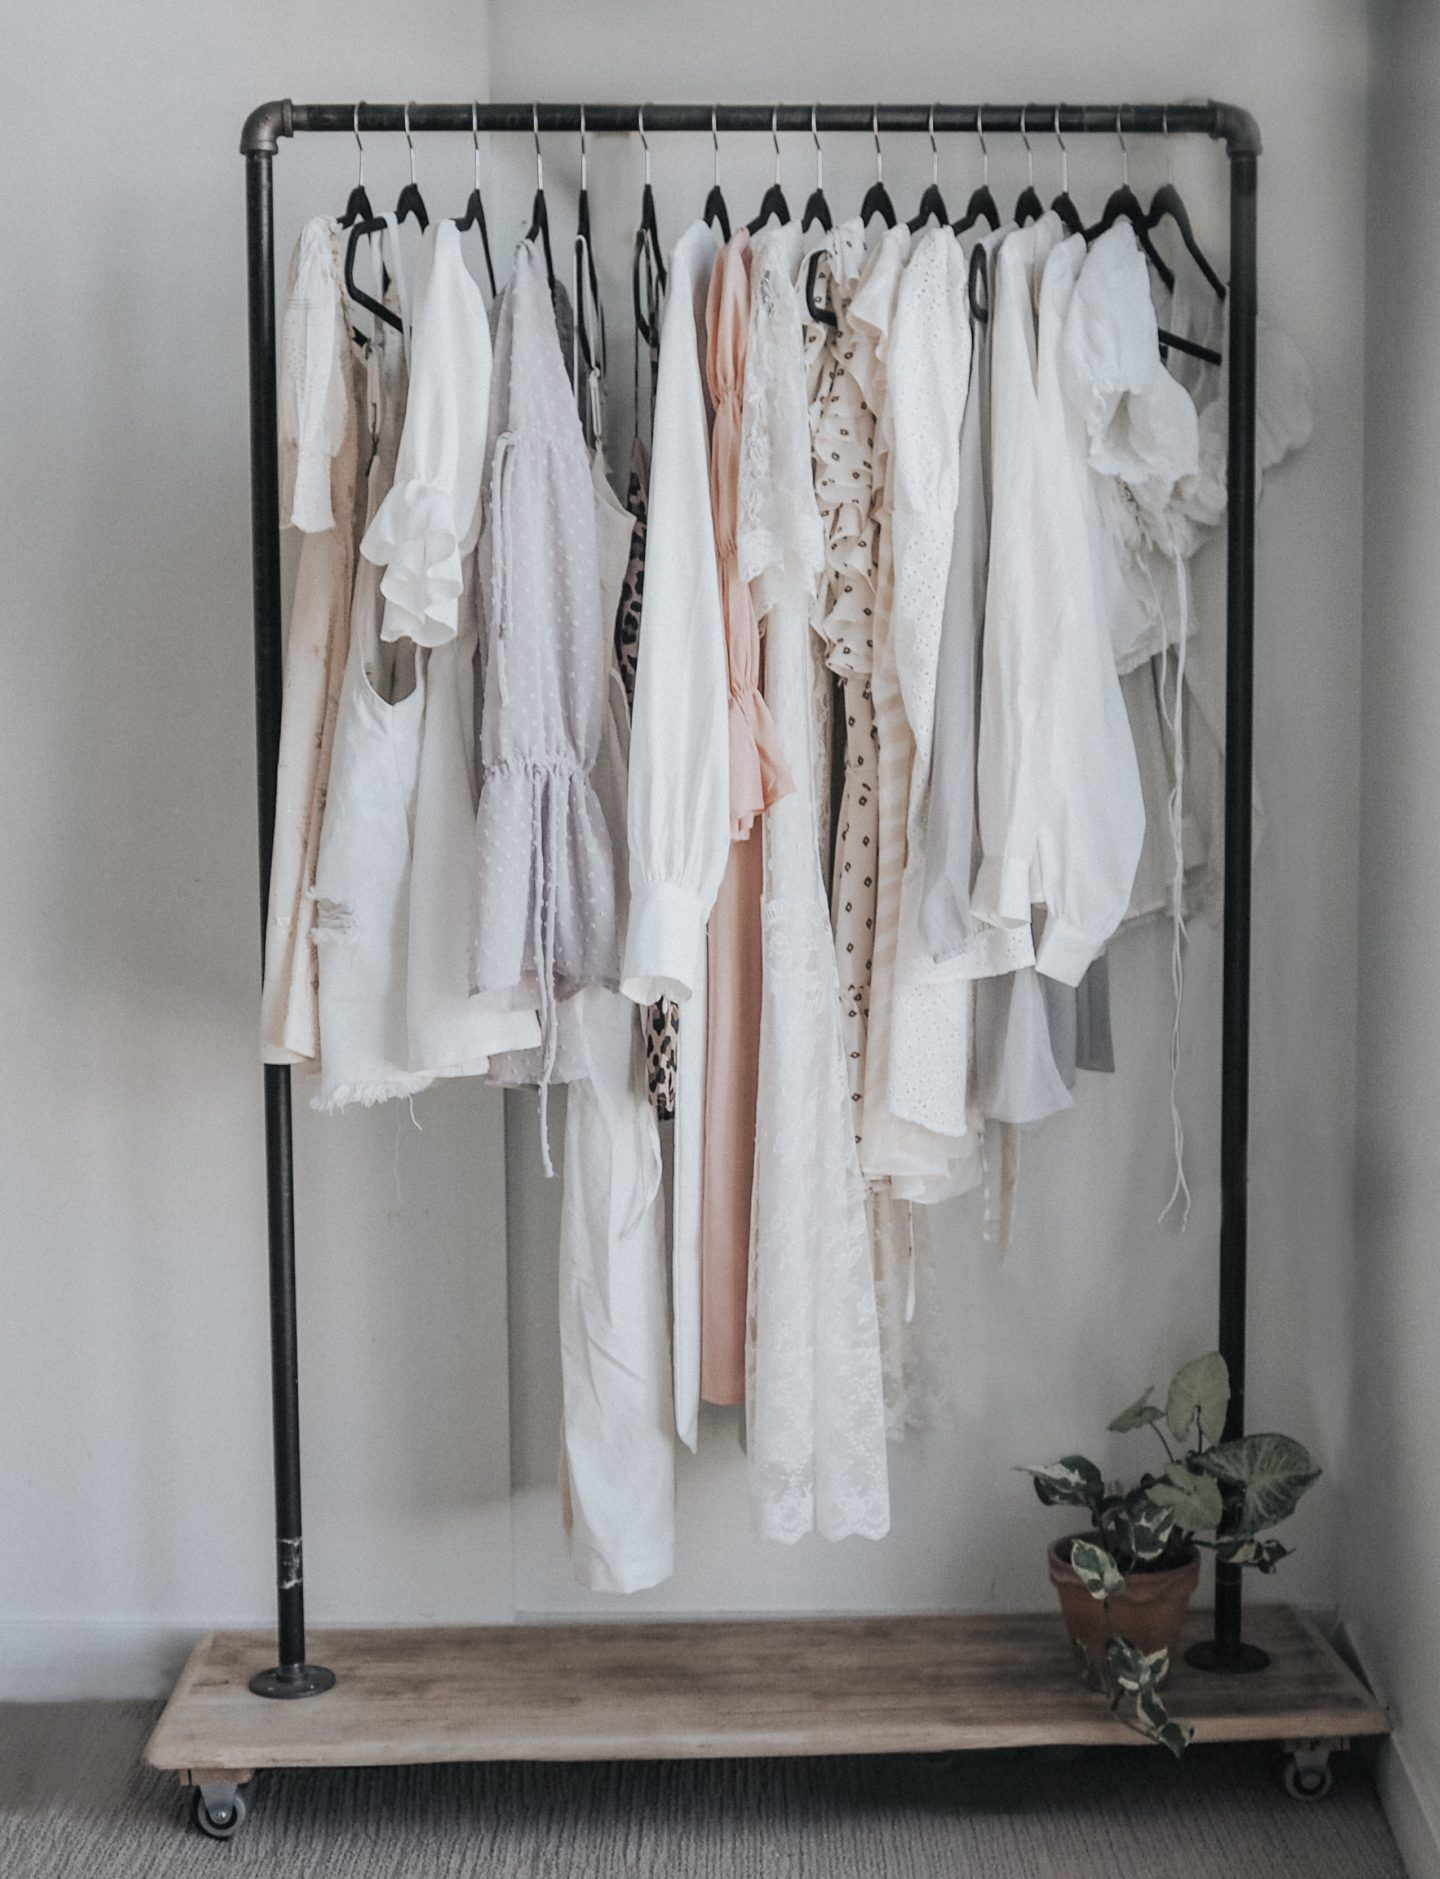 Diy Garment Rack Tutorial Garment Racks Clothing Rack Home Diy